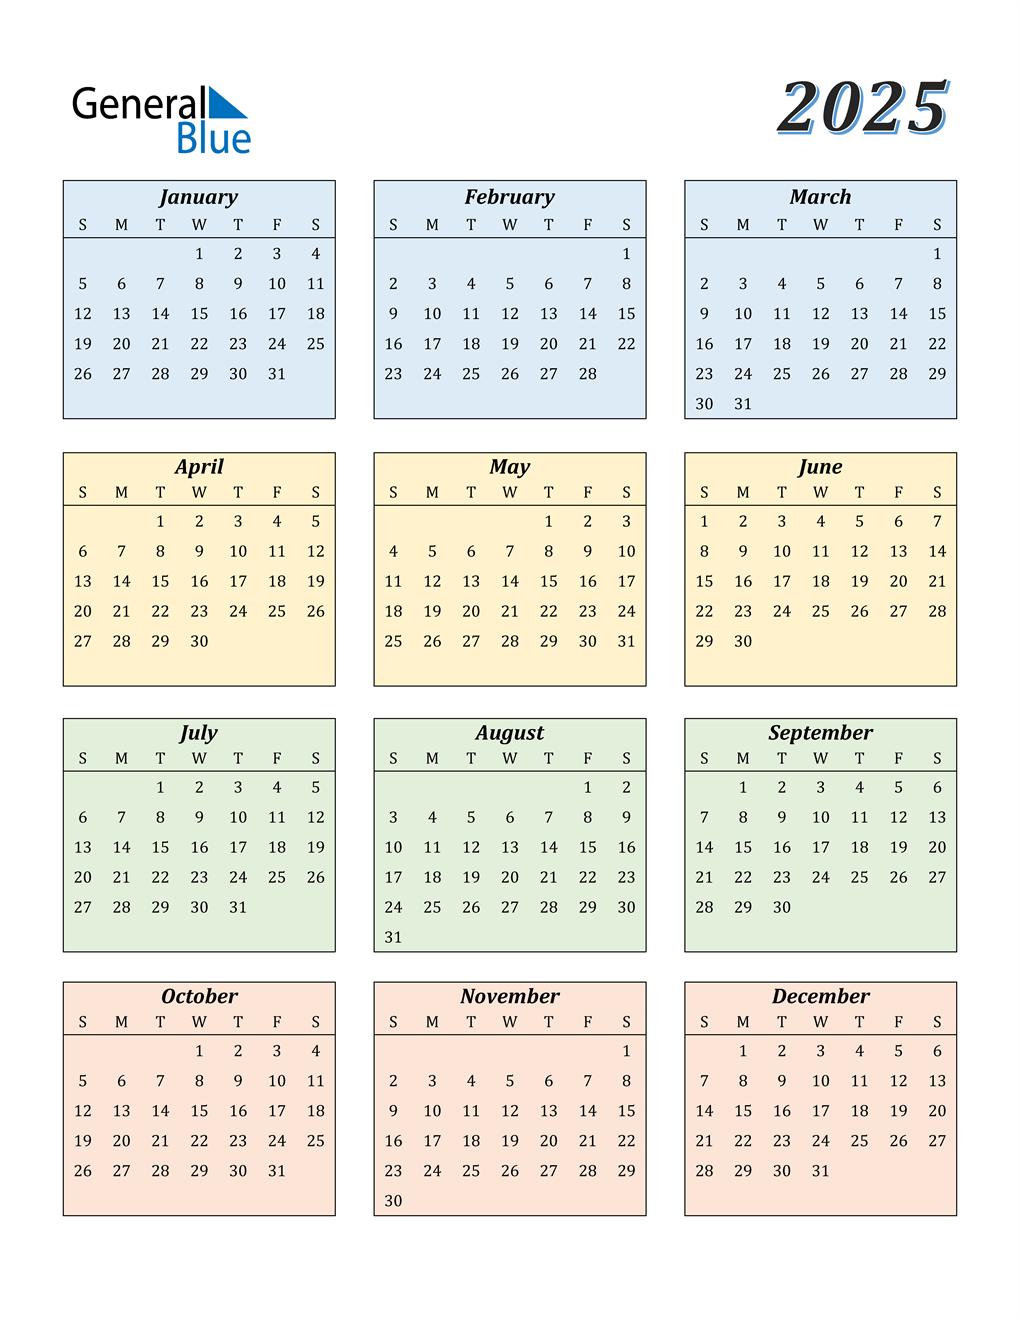 Cuny Spring 2022 Calendar.Monthly Calendar To Print December 2021 2025 2022 Calendar